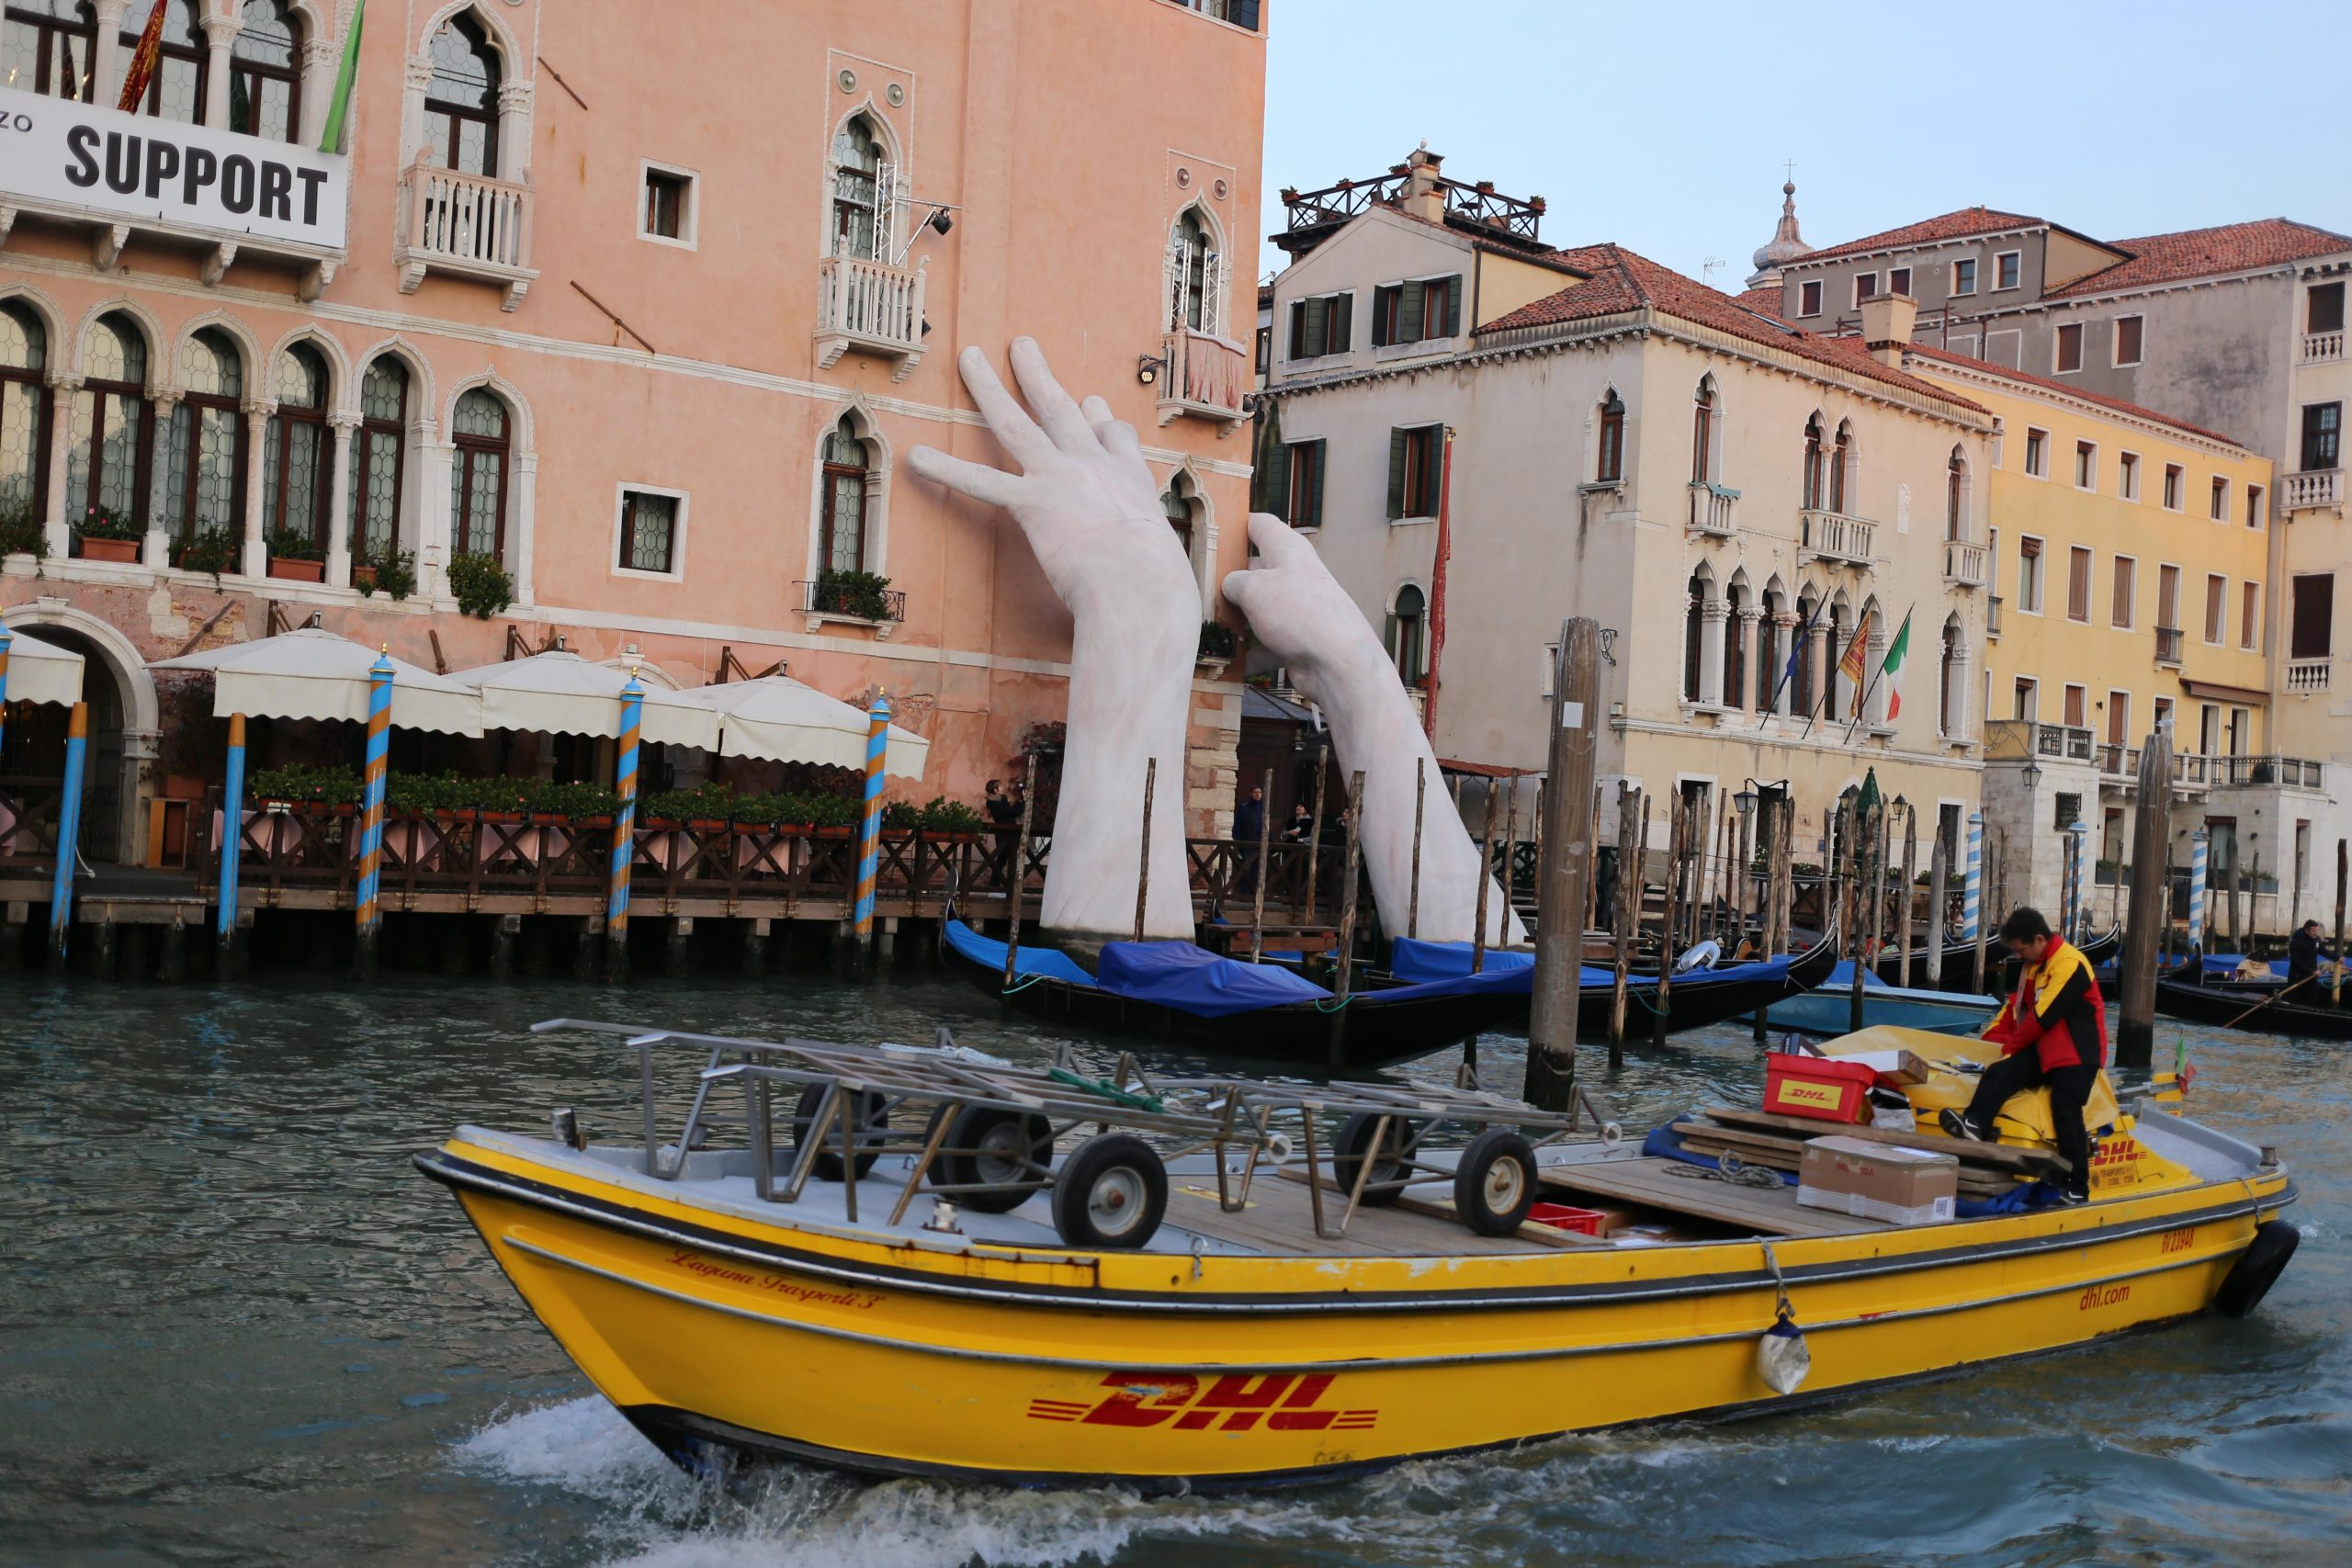 DHL in Venice